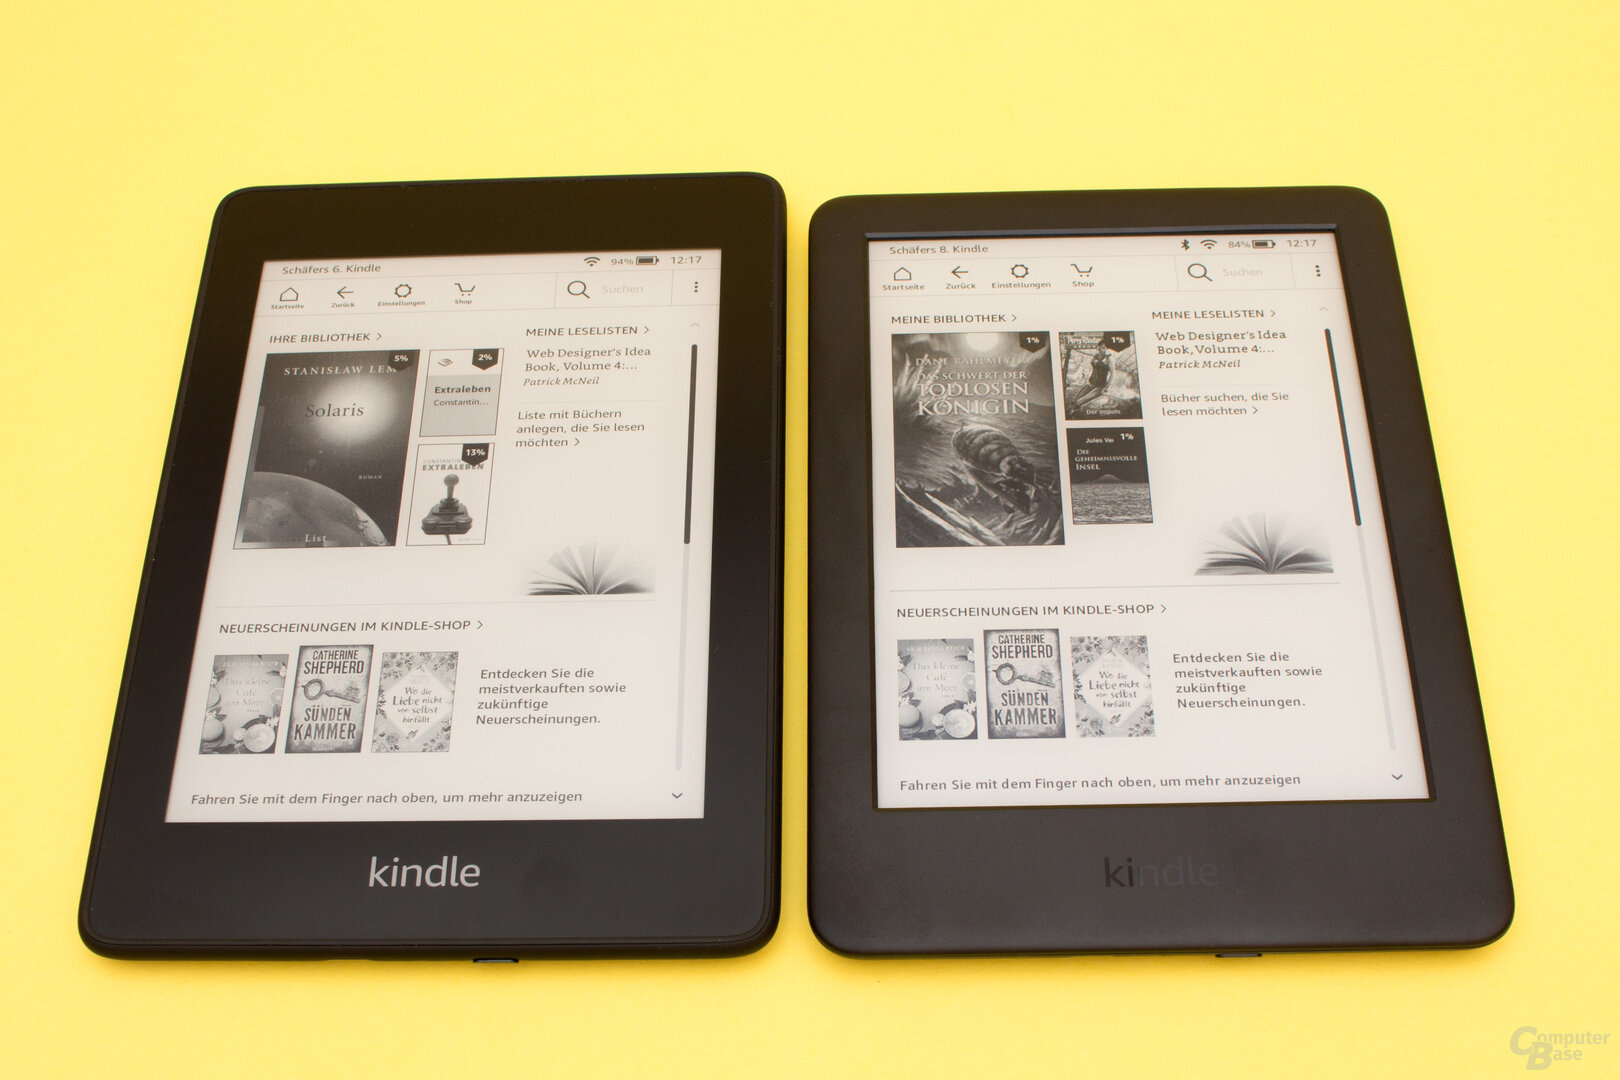 Größenvergleich Kindle Paperwhite 2018 (links) und dem Kindle 2019 (rechts)